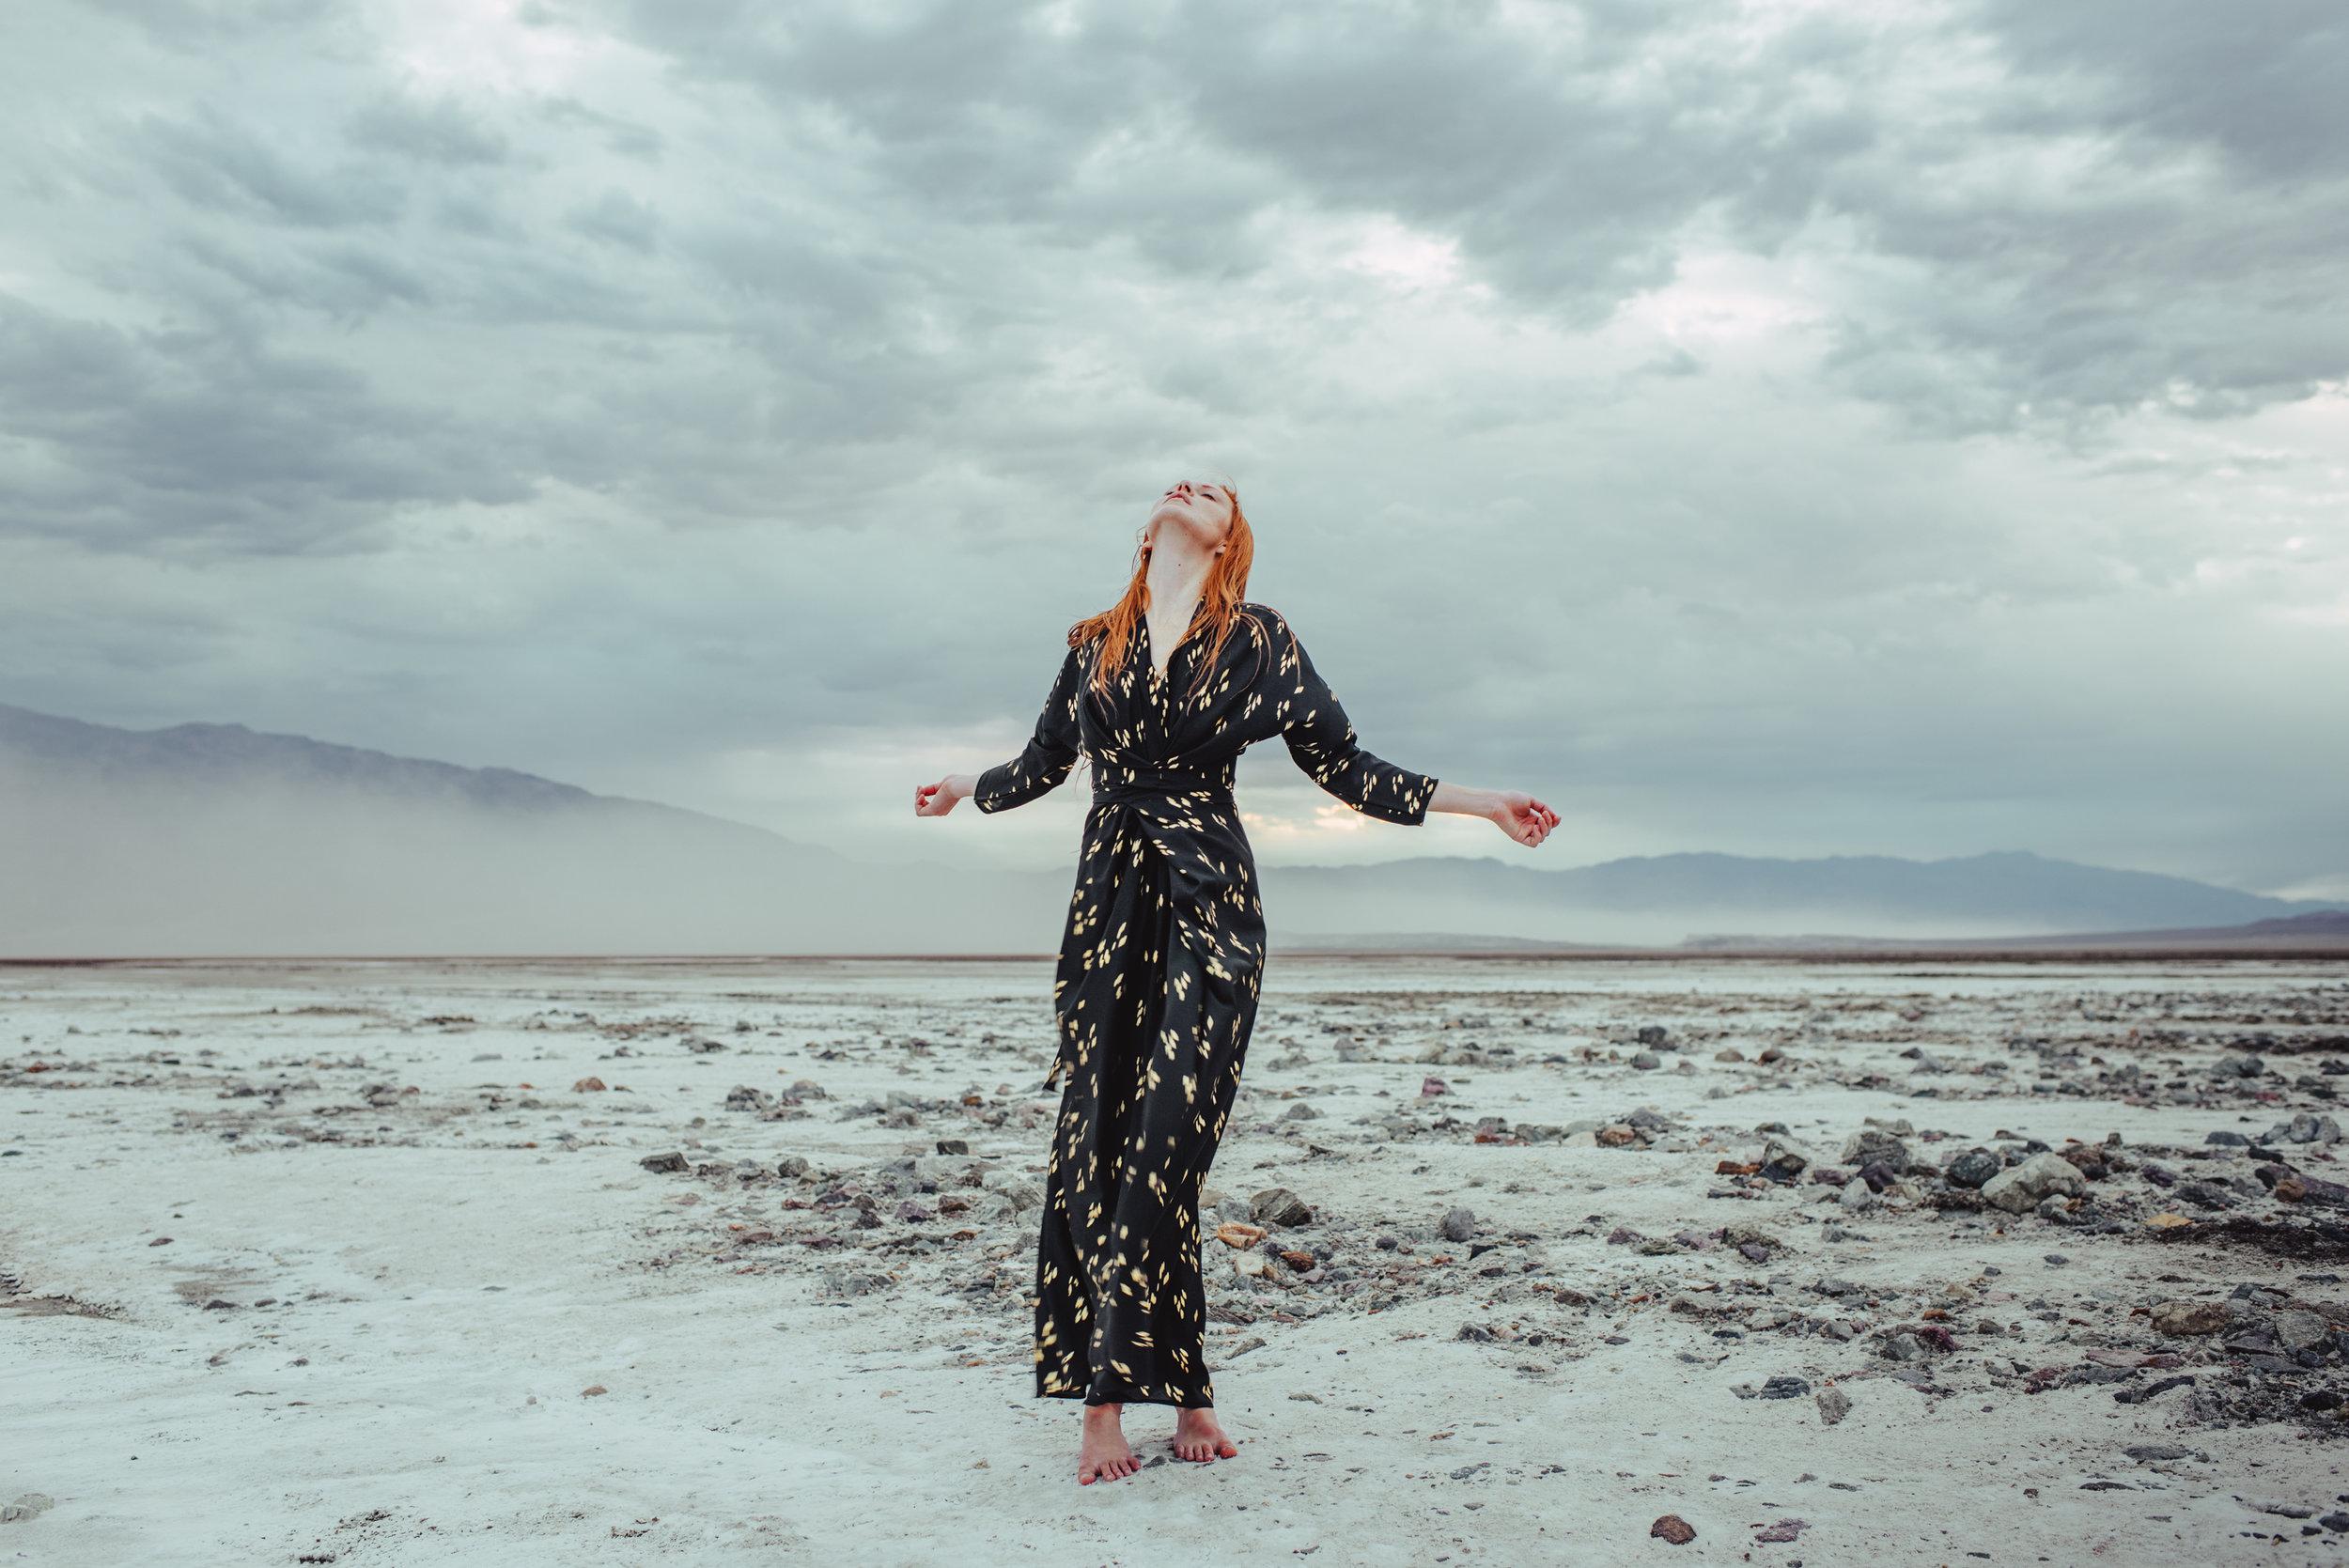 Death Valley Editorial Salt Flats editorial Las Vegas Photographer-14.jpg